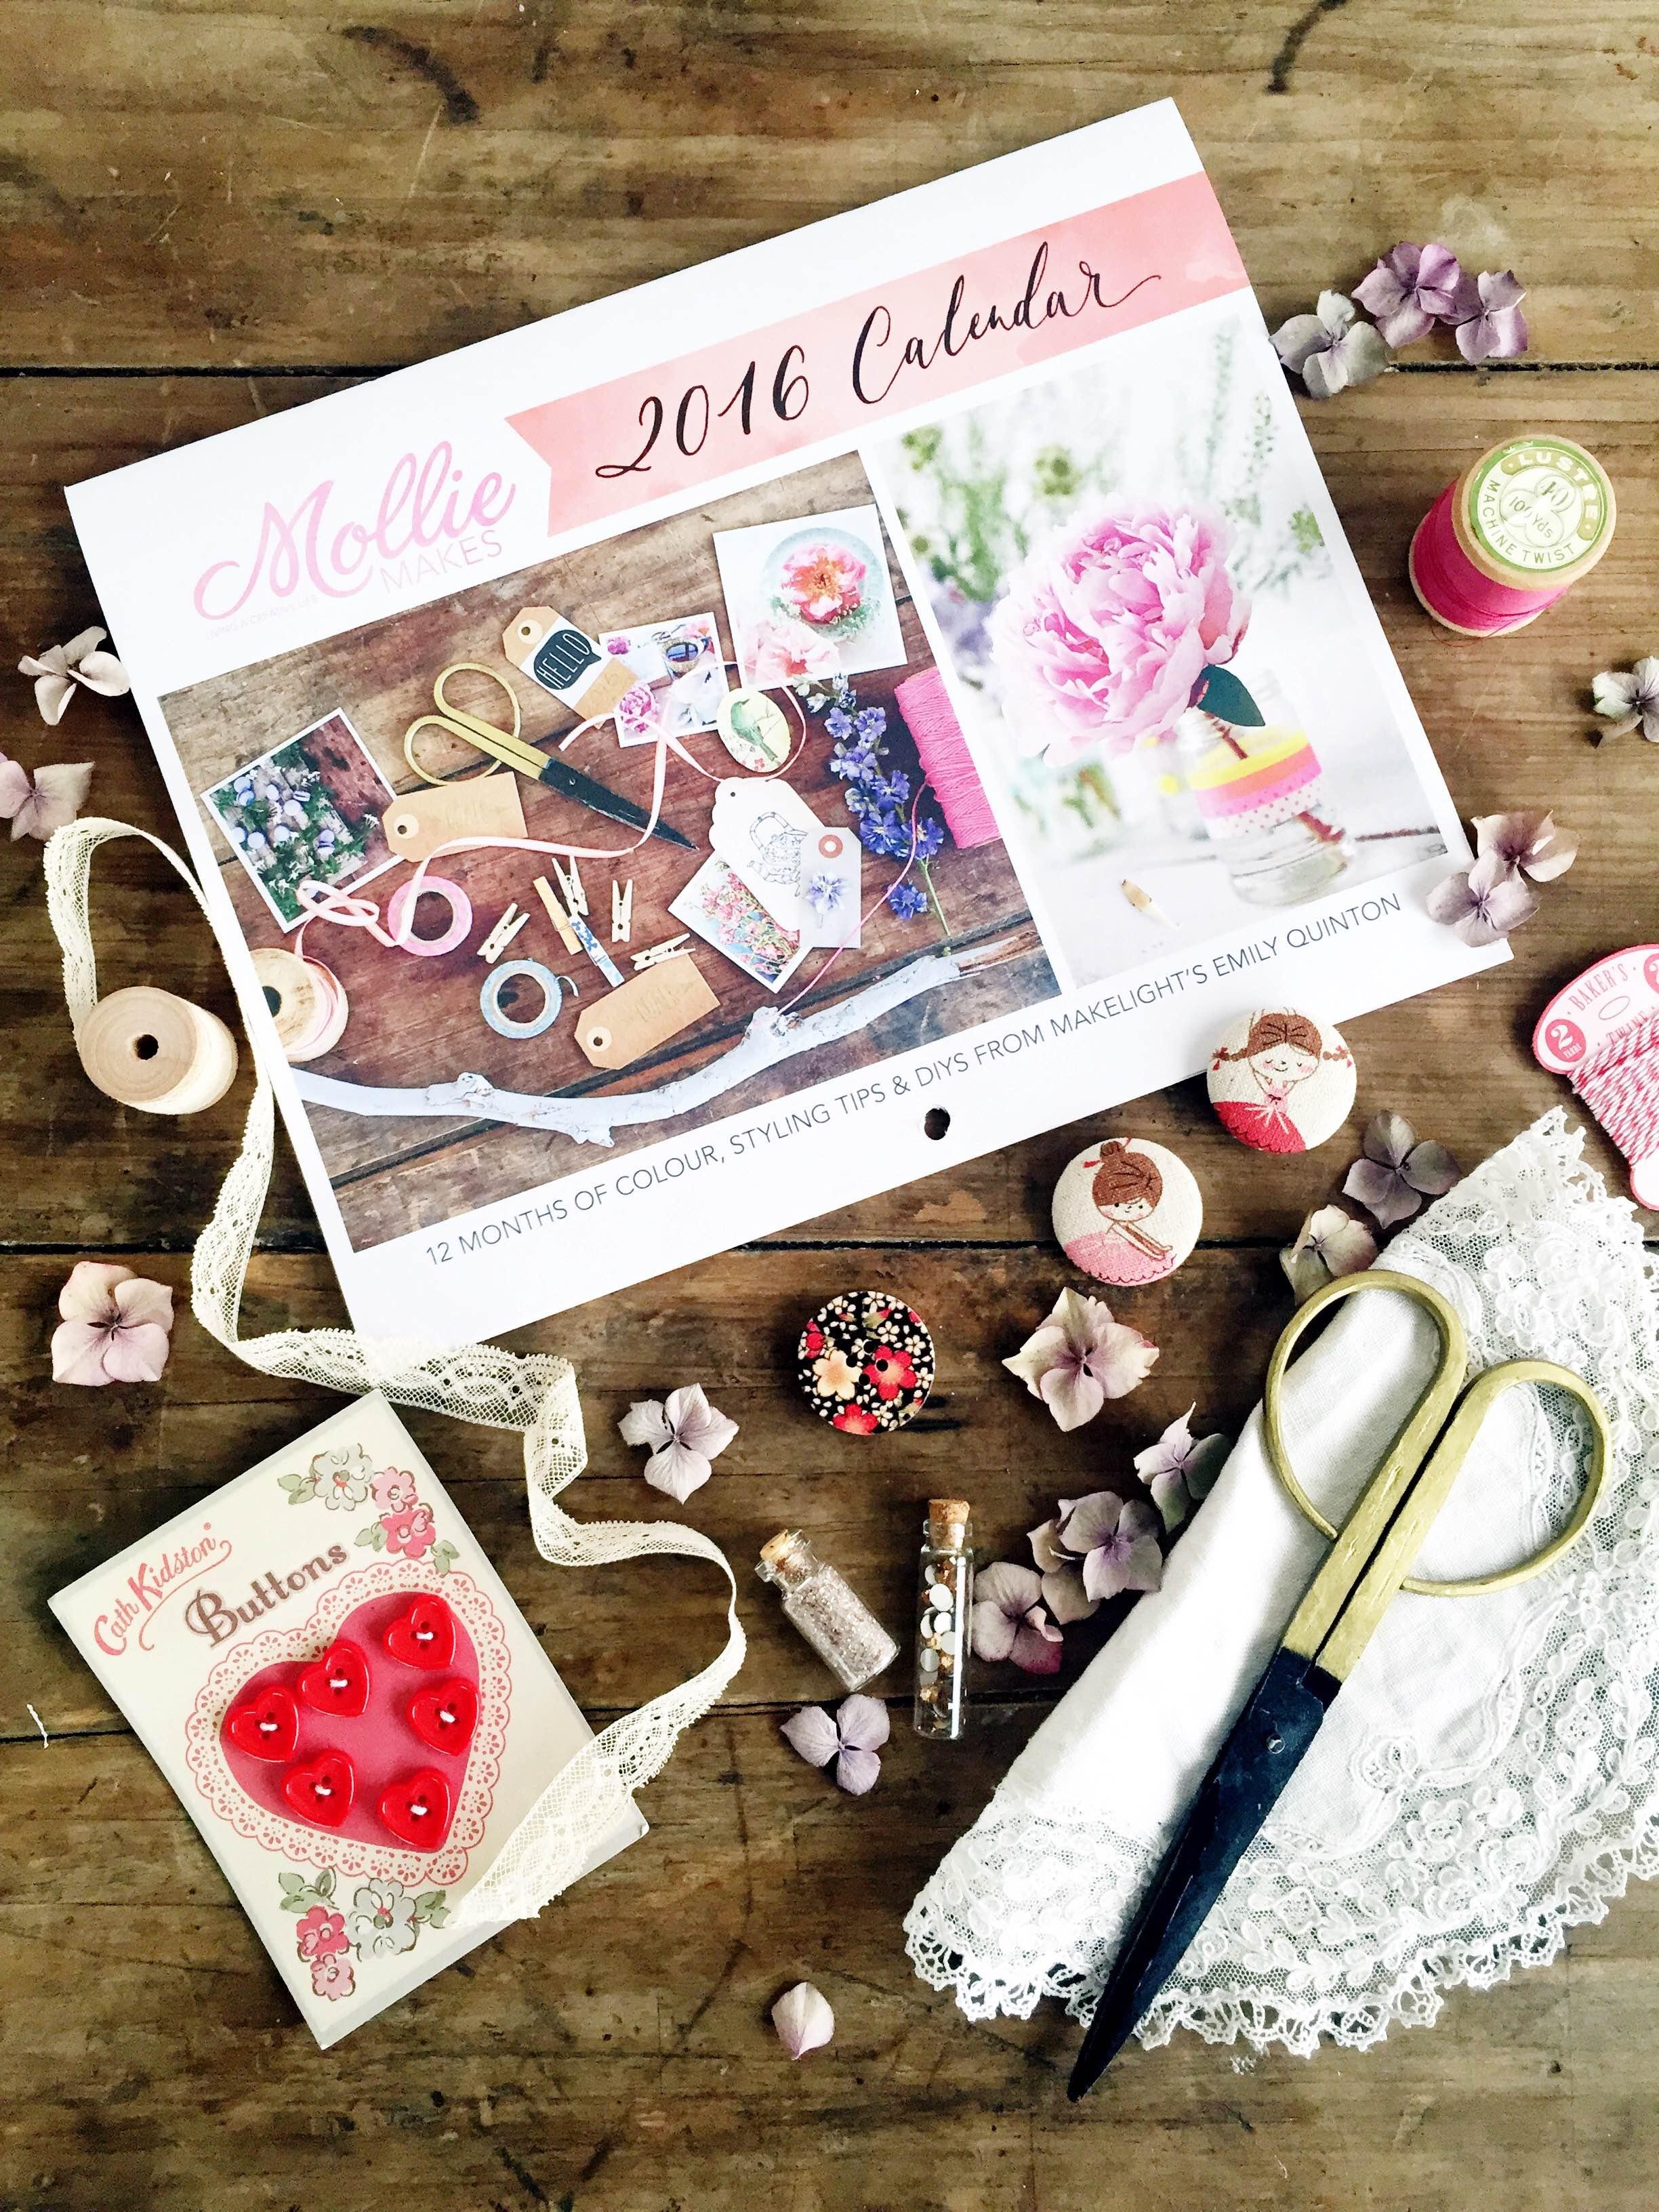 Mollie Makes 2016 Calendar by Emily Quinton | Makelight